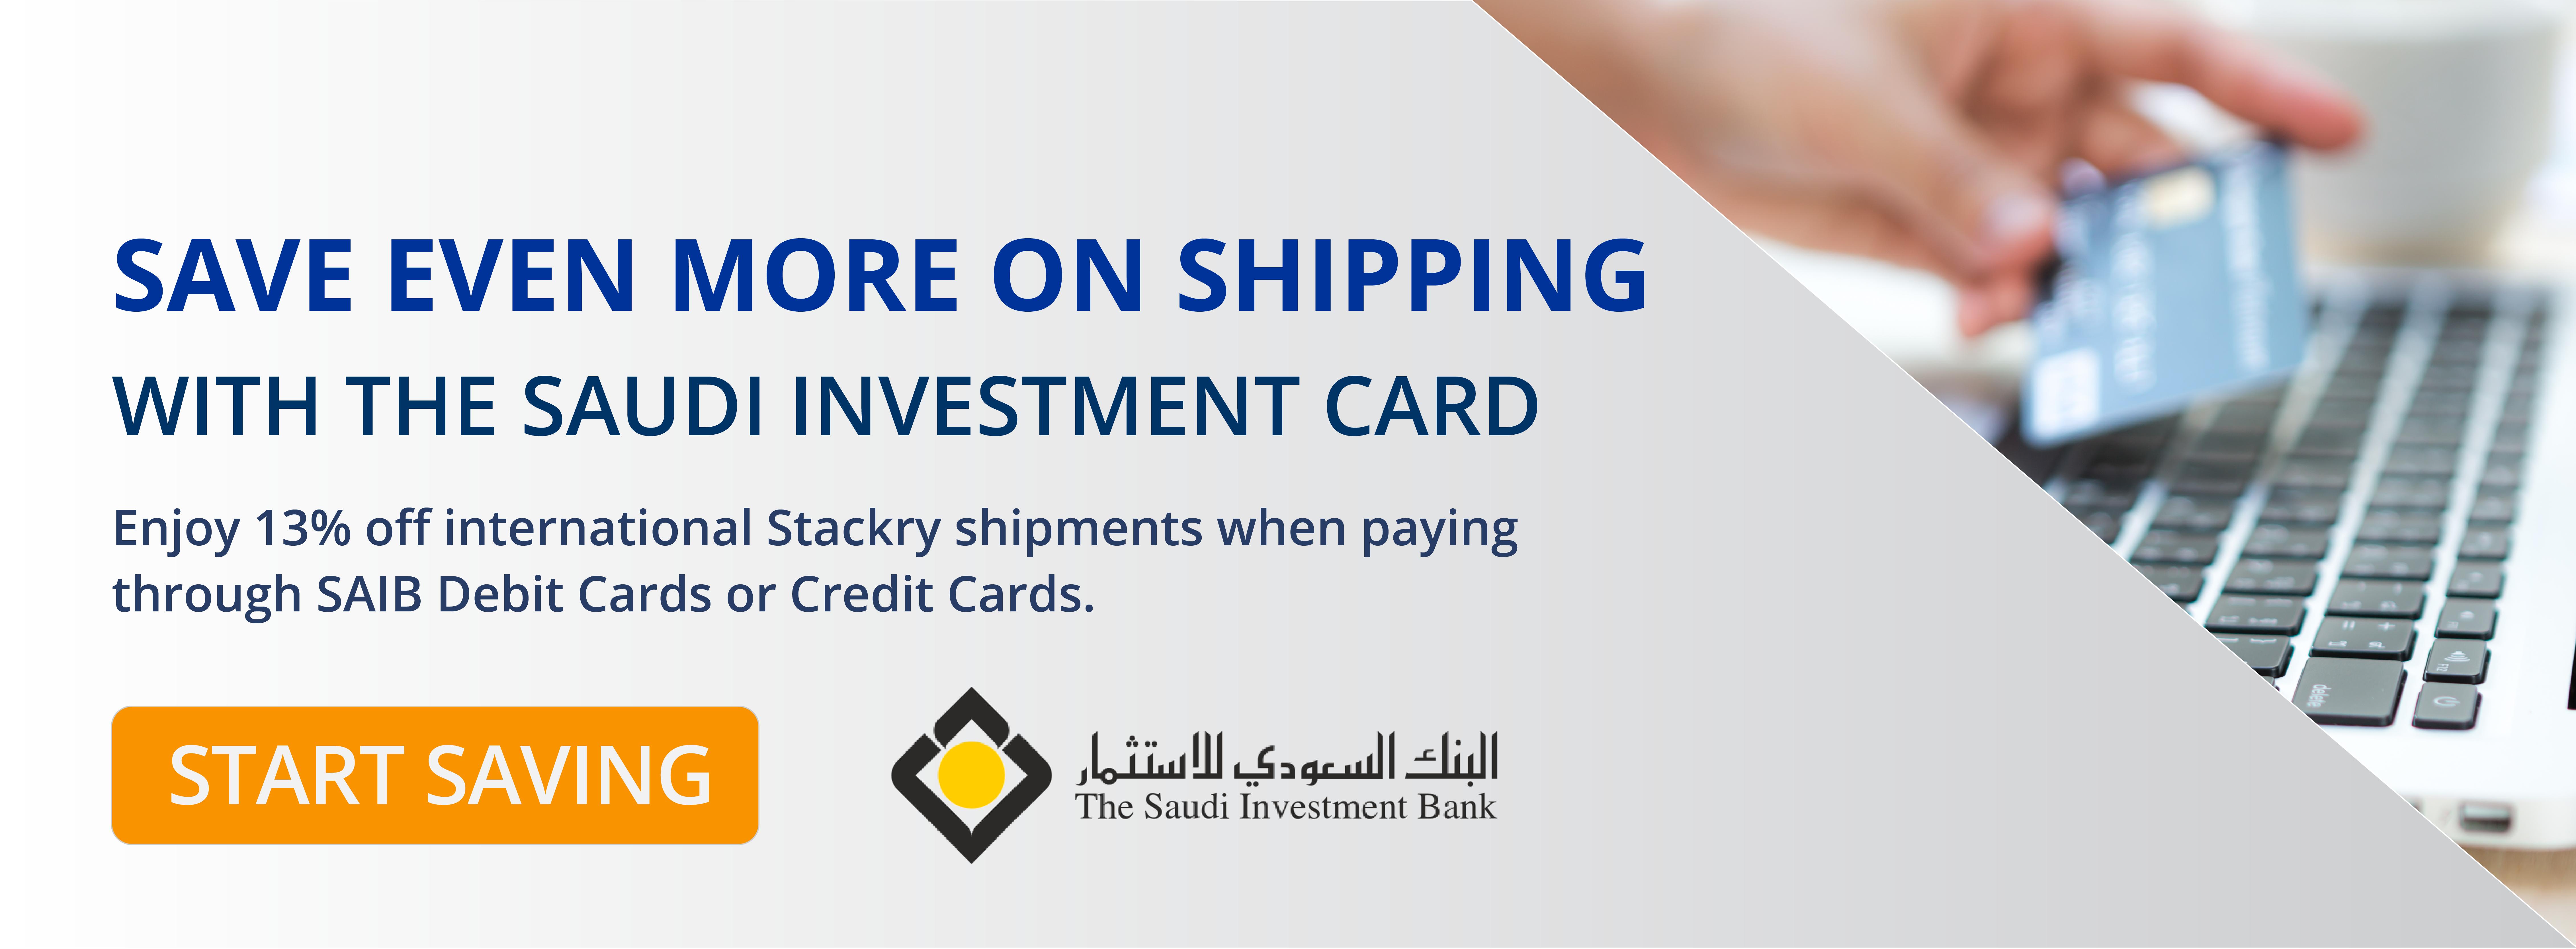 Enjoy 13% off international Stackry shipments when paying through SAIB Debit Cards or Credit Cards. Start Saving!